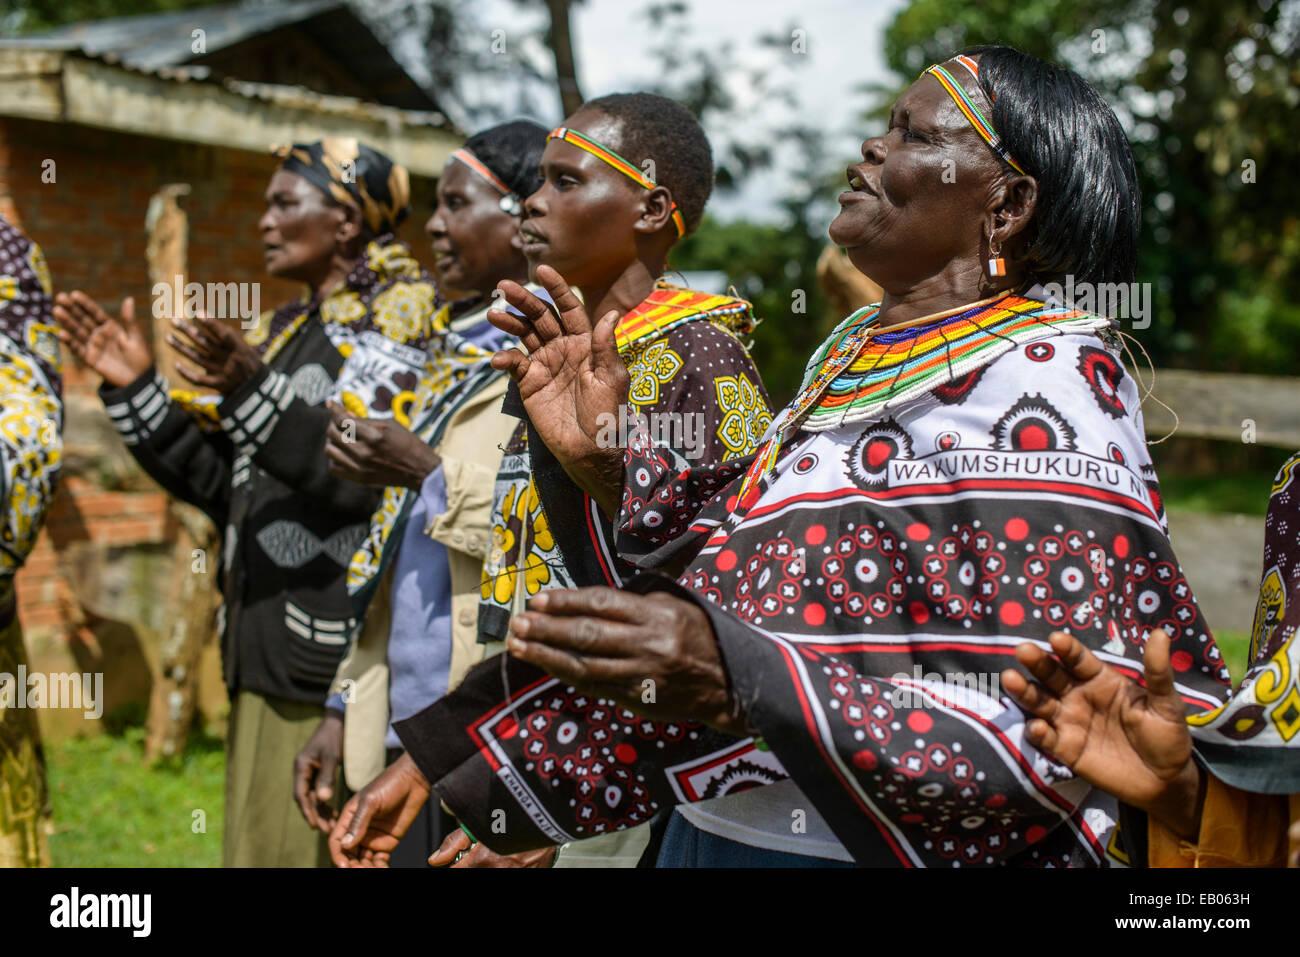 Women of the Pokot tribe sing and dance, Kenya - Stock Image